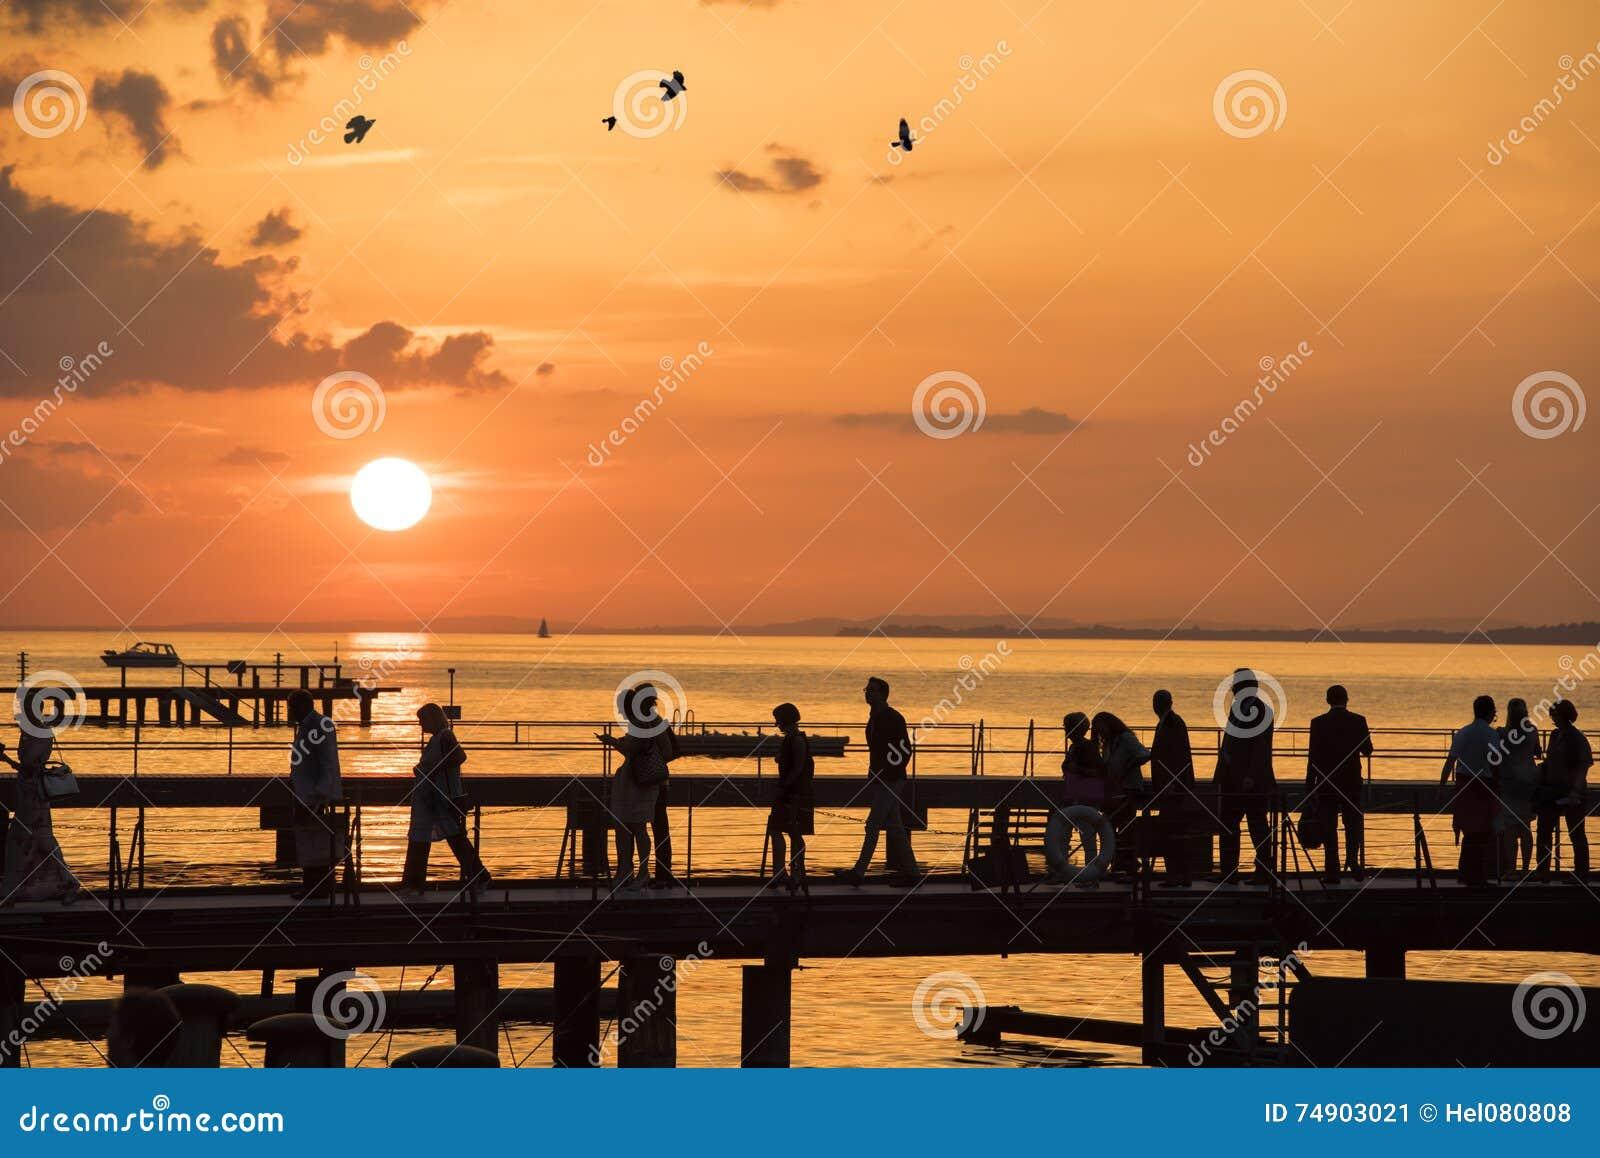 People walking on sunset over bridge on lake